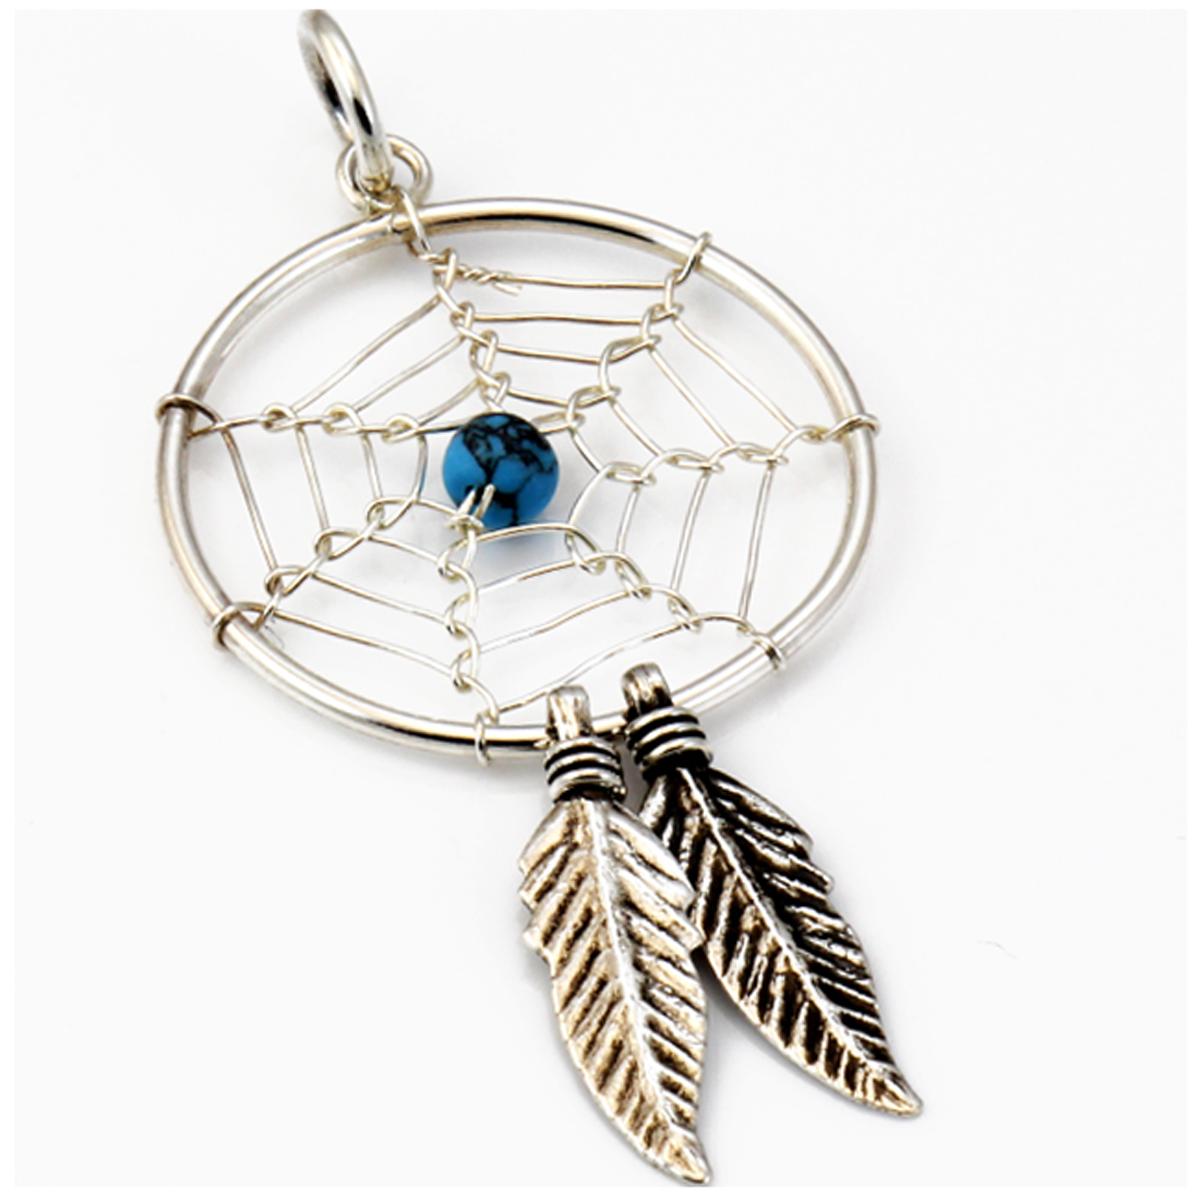 Pendentif Argent artisanal \'Heaven\' turquoise - 35x20 mm (dreamcatcher) - [R4560]